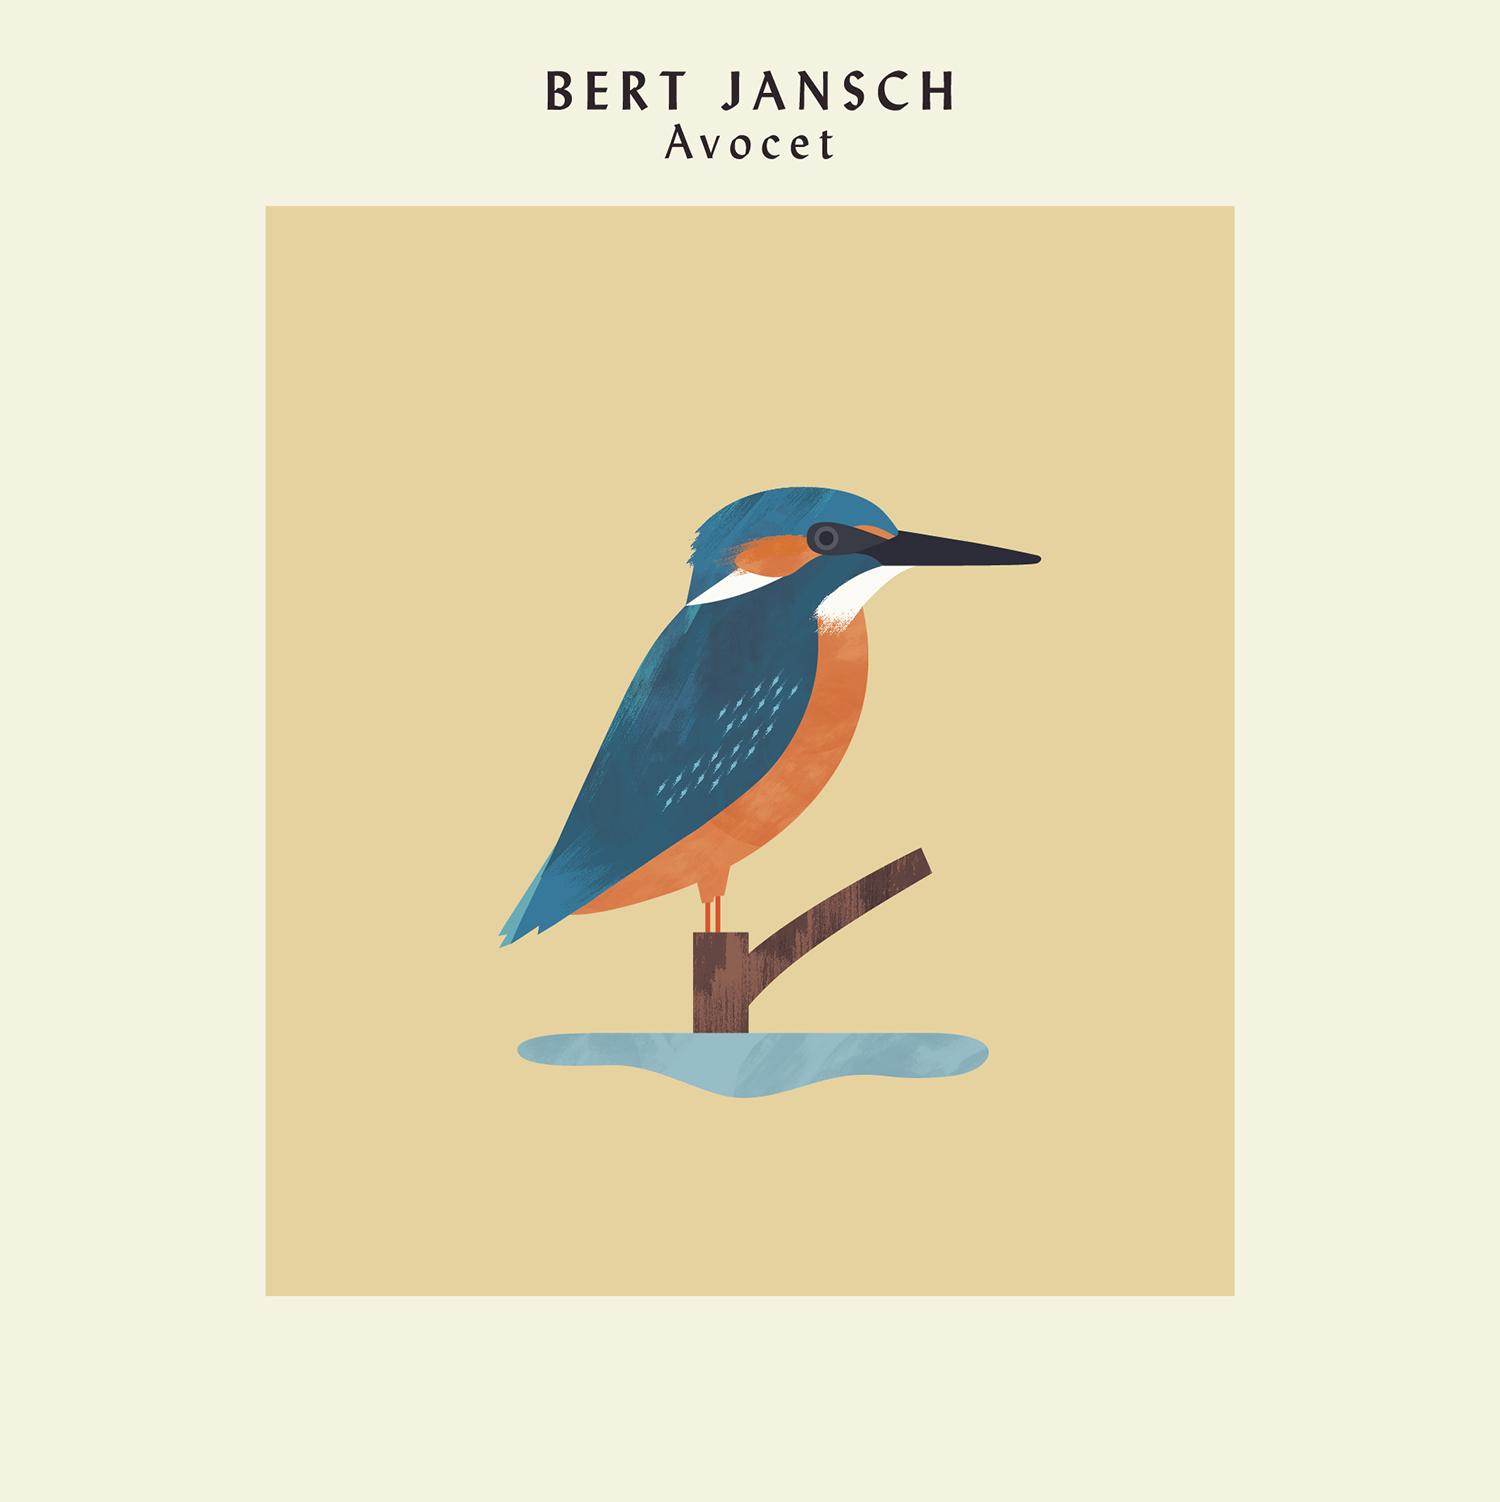 hannah-alice-bert-jansch-kingfisher-record-bird-illustration-1.jpg